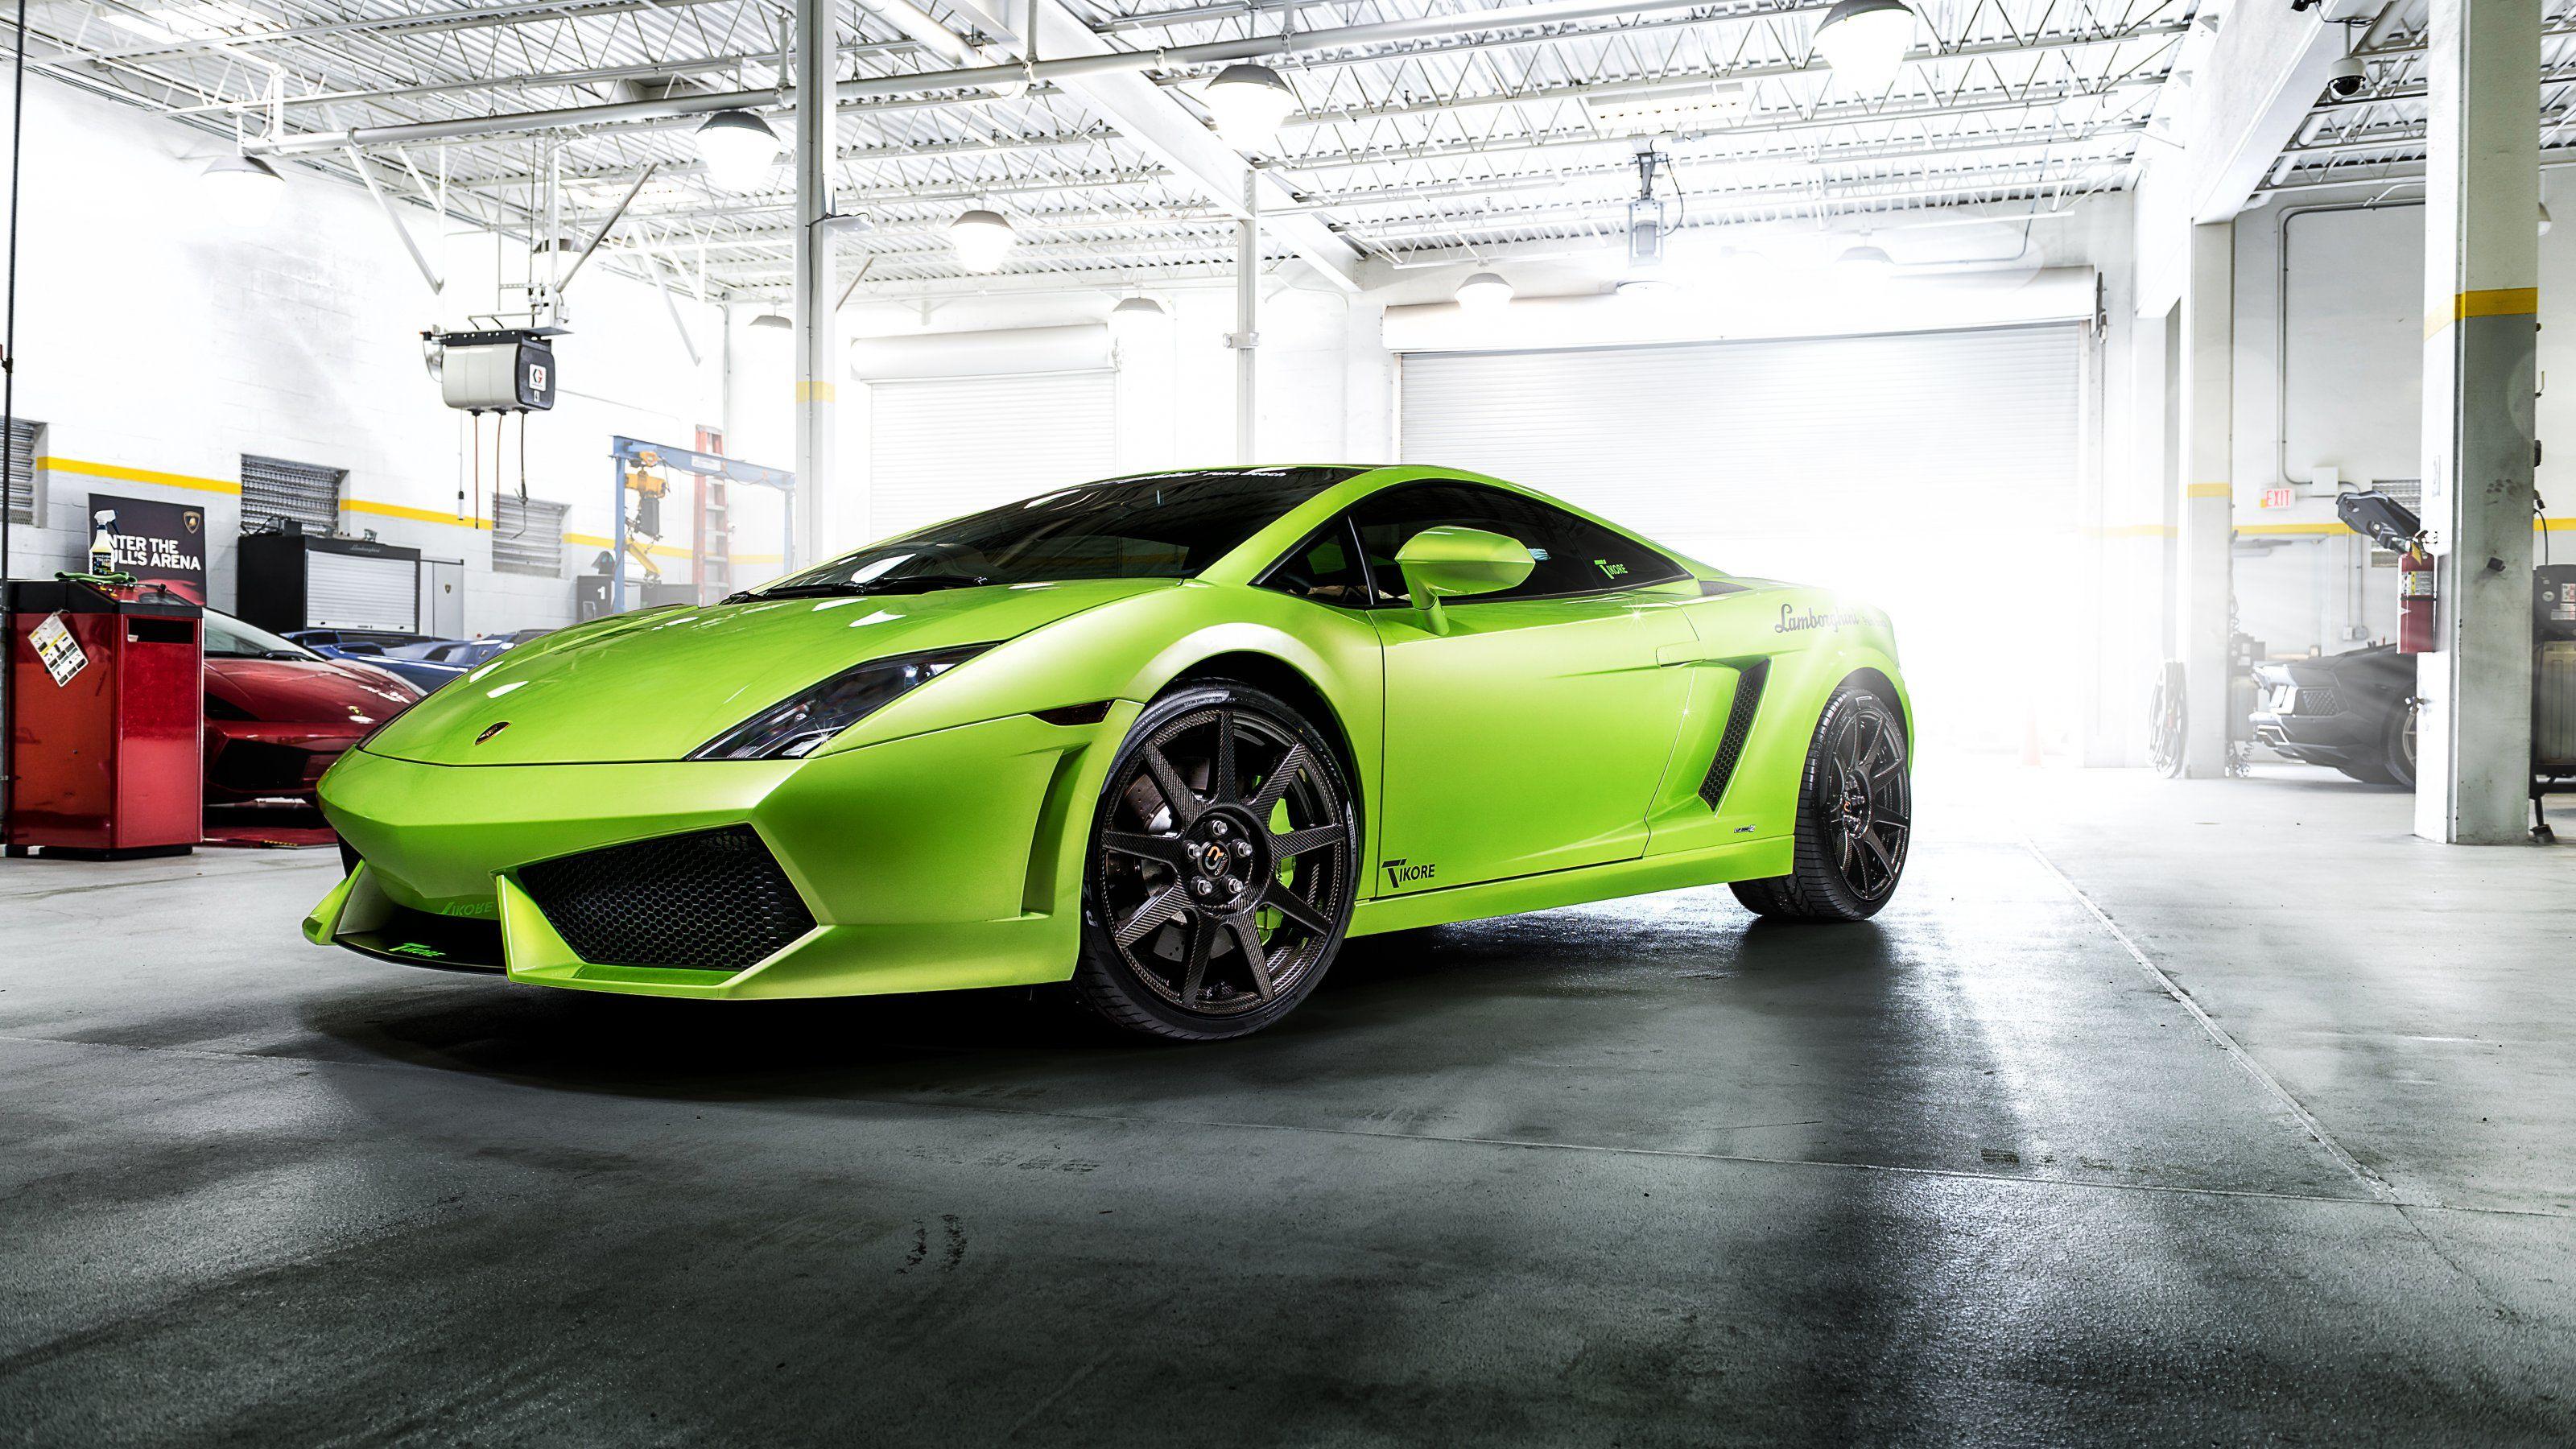 3200x1800 cars